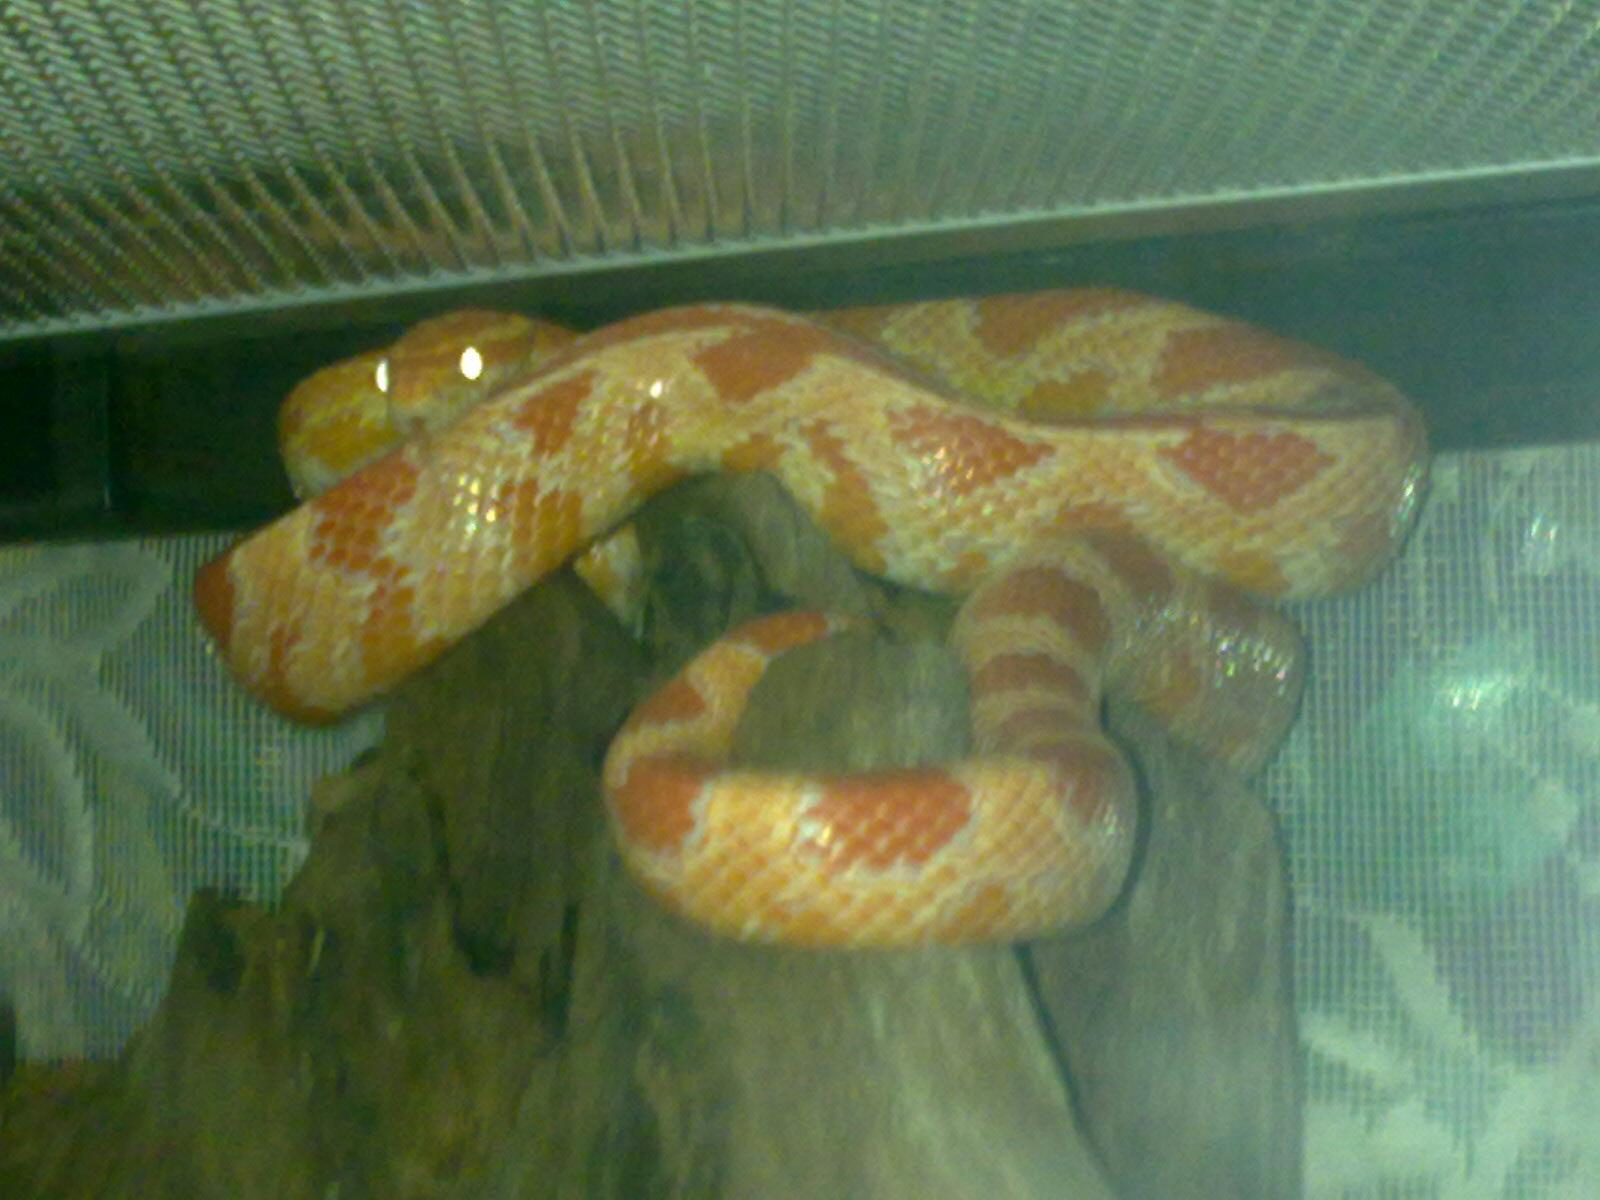 Baby Candy Cane Corn Snake Albino Candy Cane Corn Snake